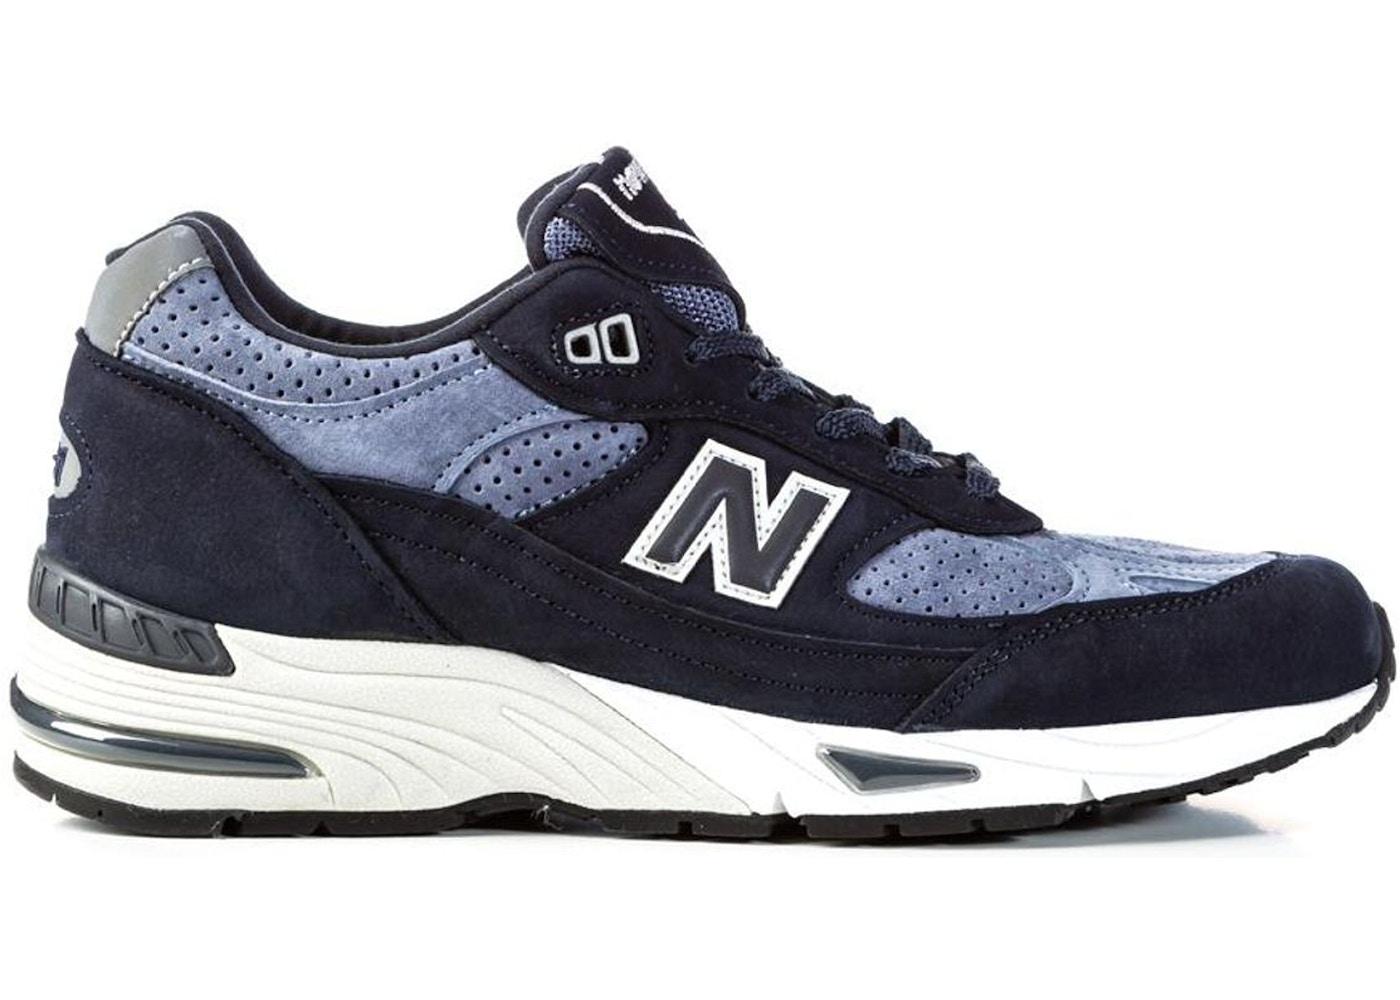 New Balance 991 Navy Grey